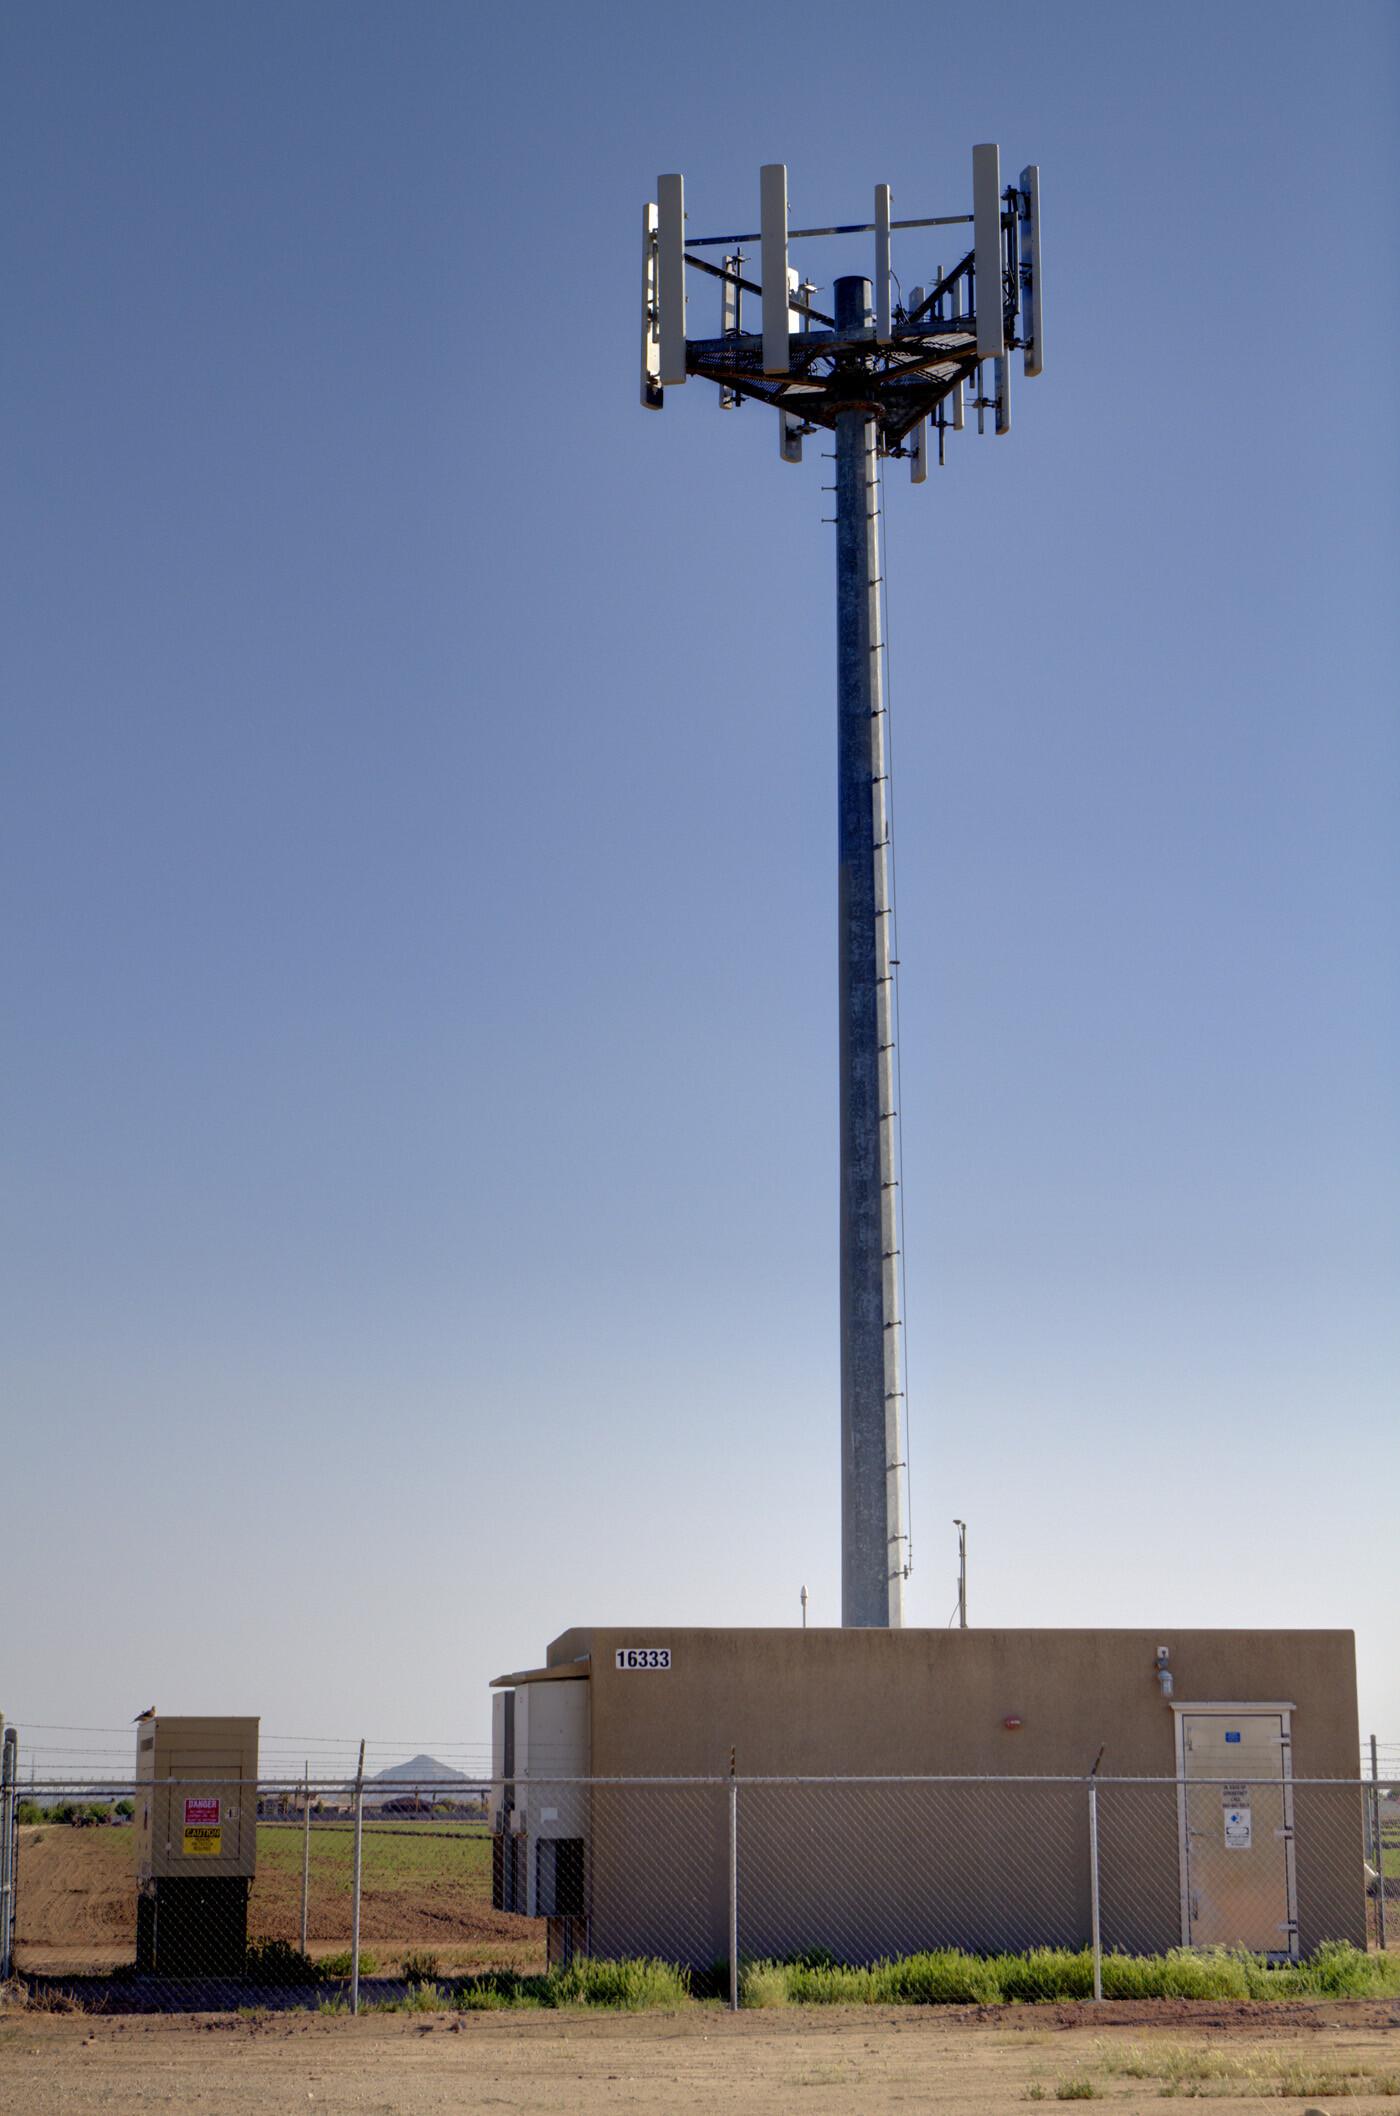 which phone company uses verizon towers